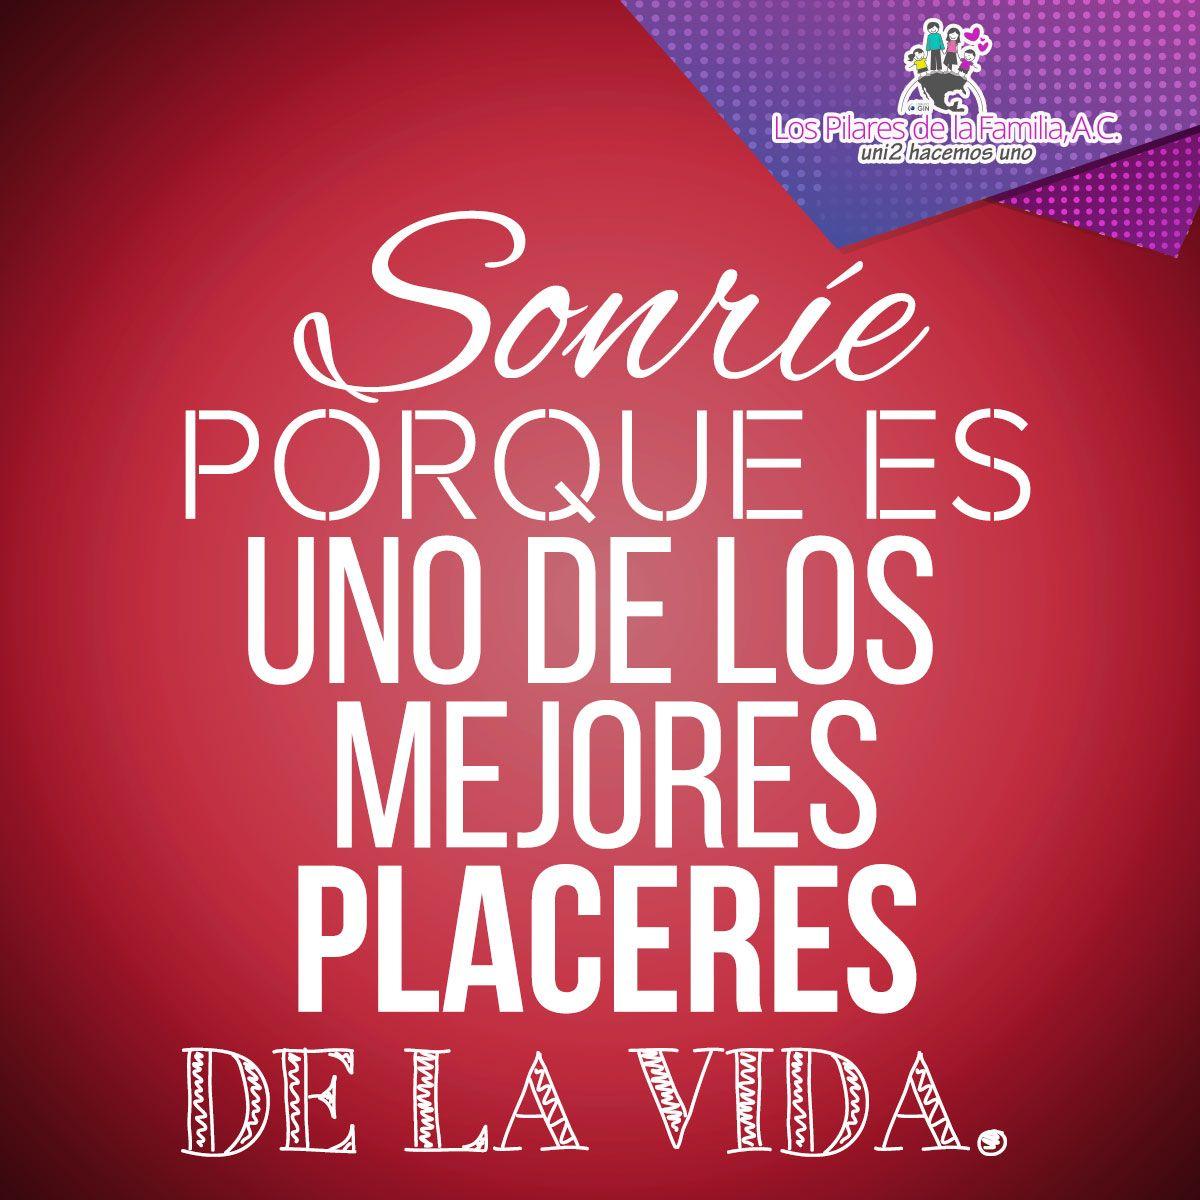 Frases Sonreír Placeres Placer Vida Frases Positivas